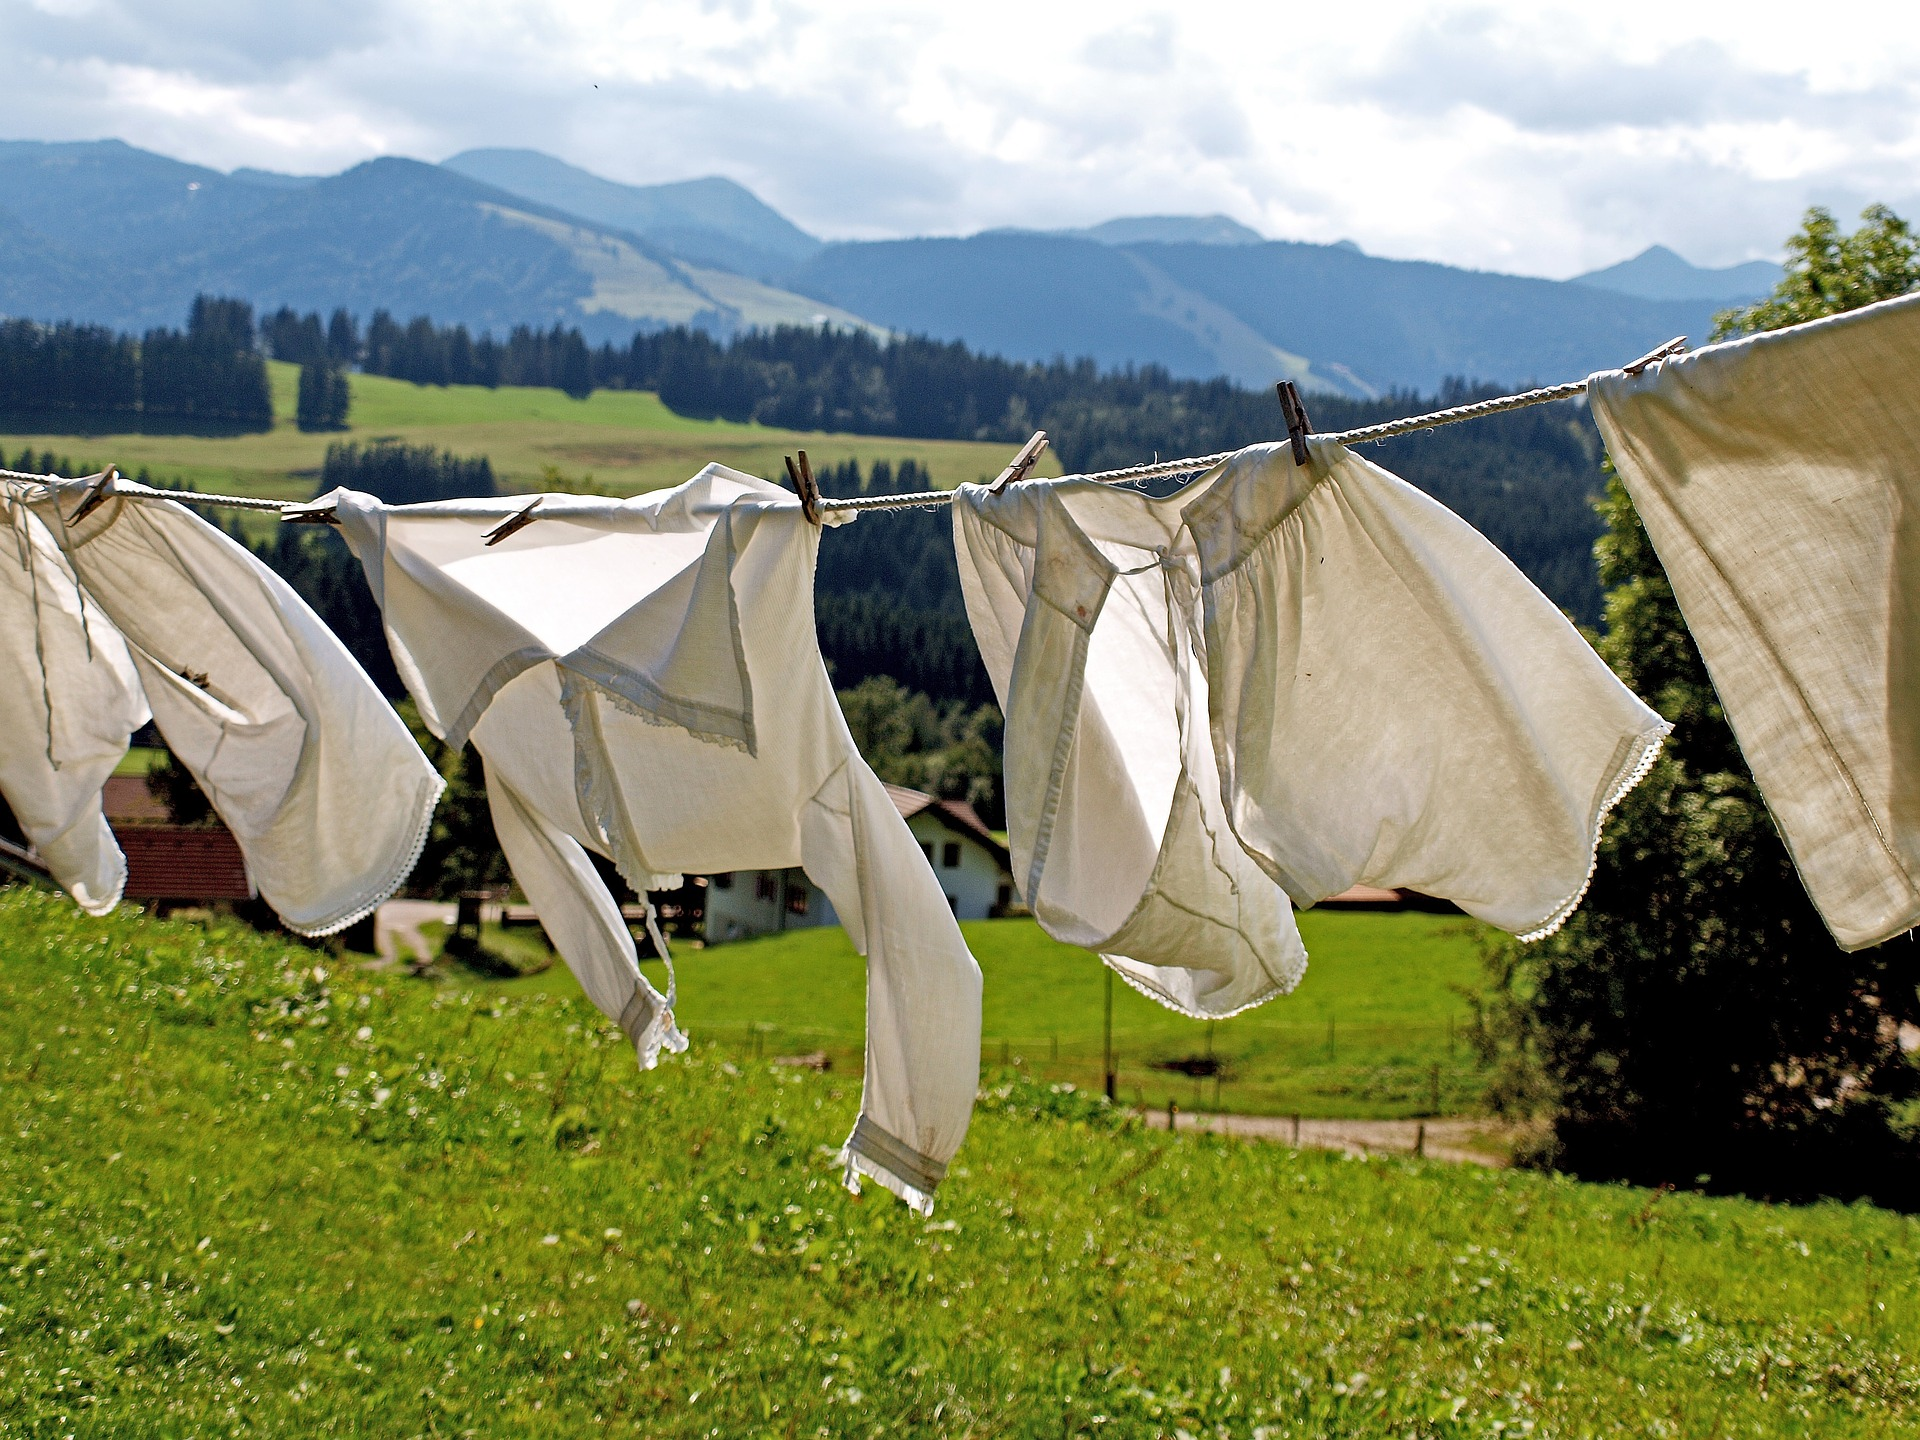 Shirts drying on a washing line